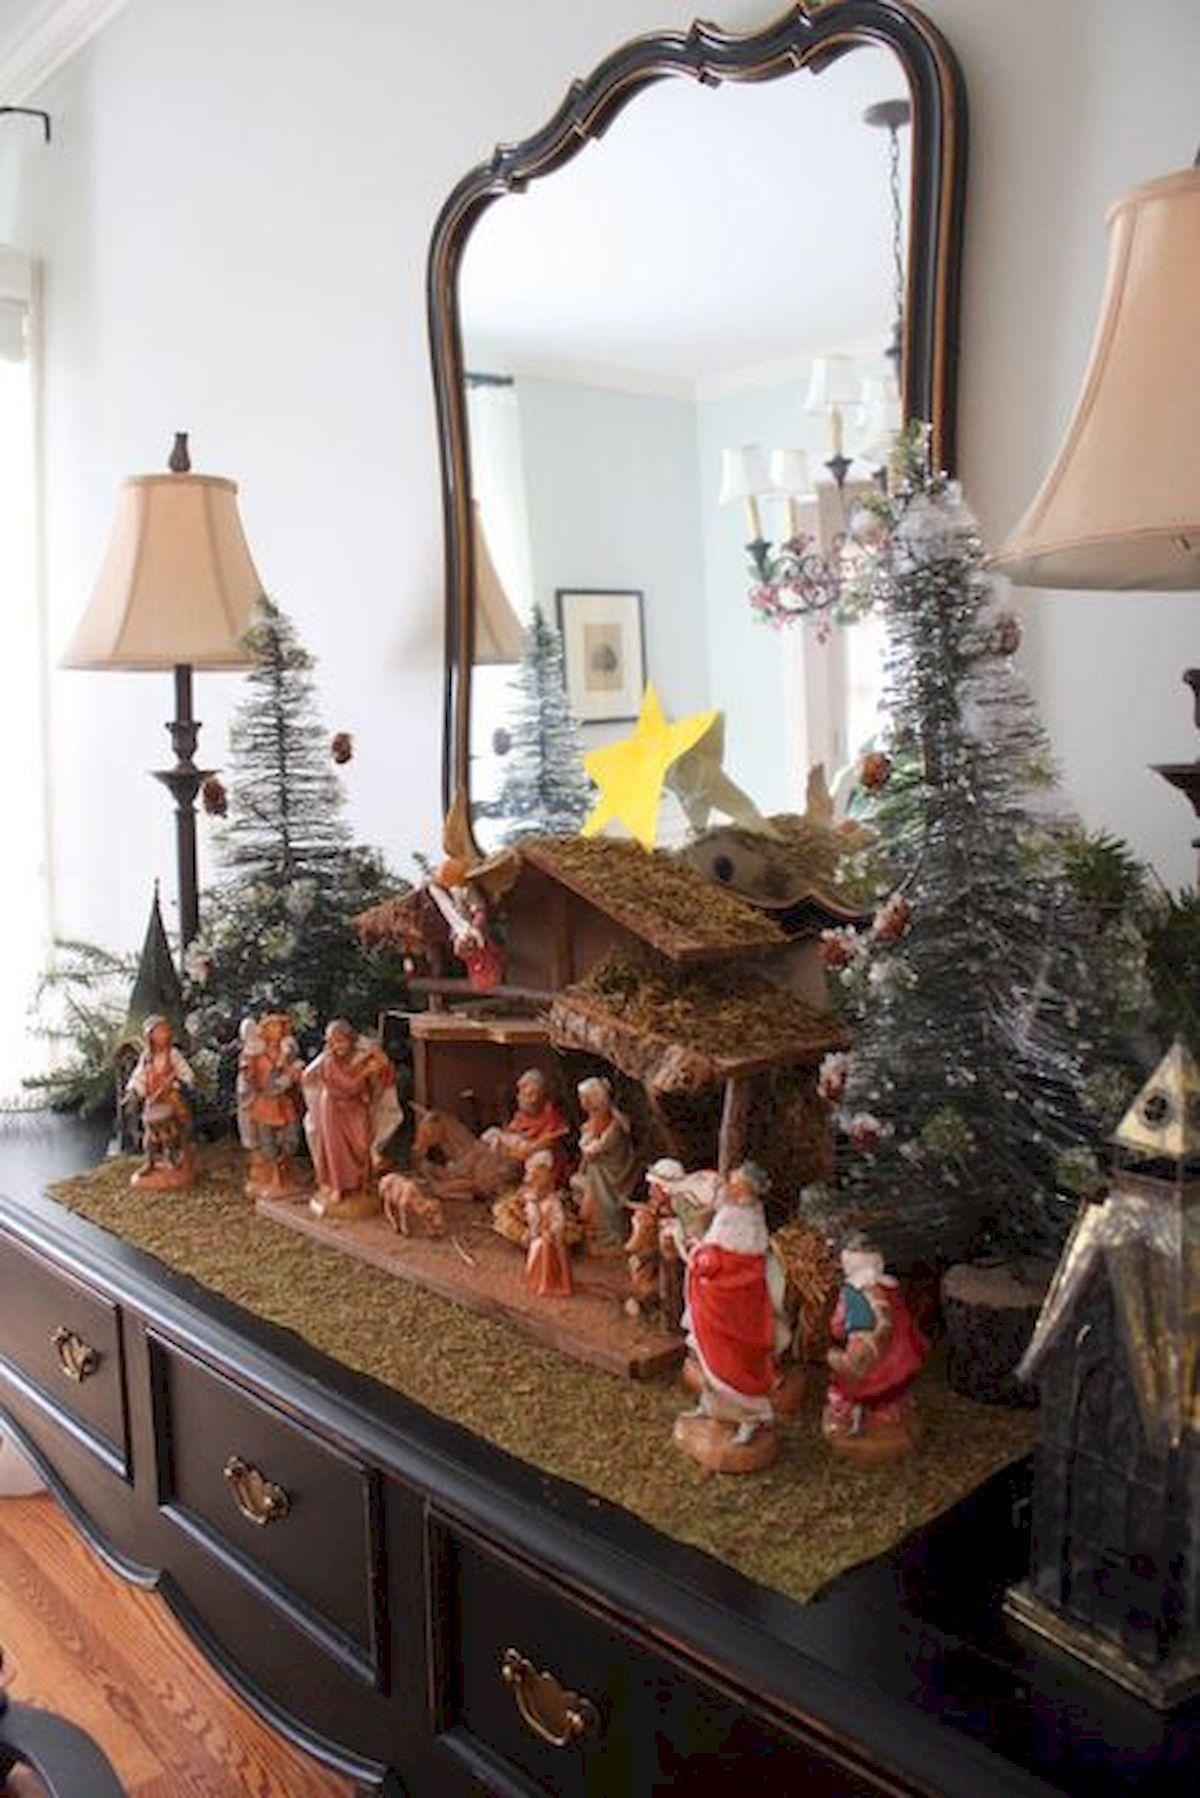 Cool 50 Easy Diy Christmas Decor Ideas Httpscoachdecorcom50